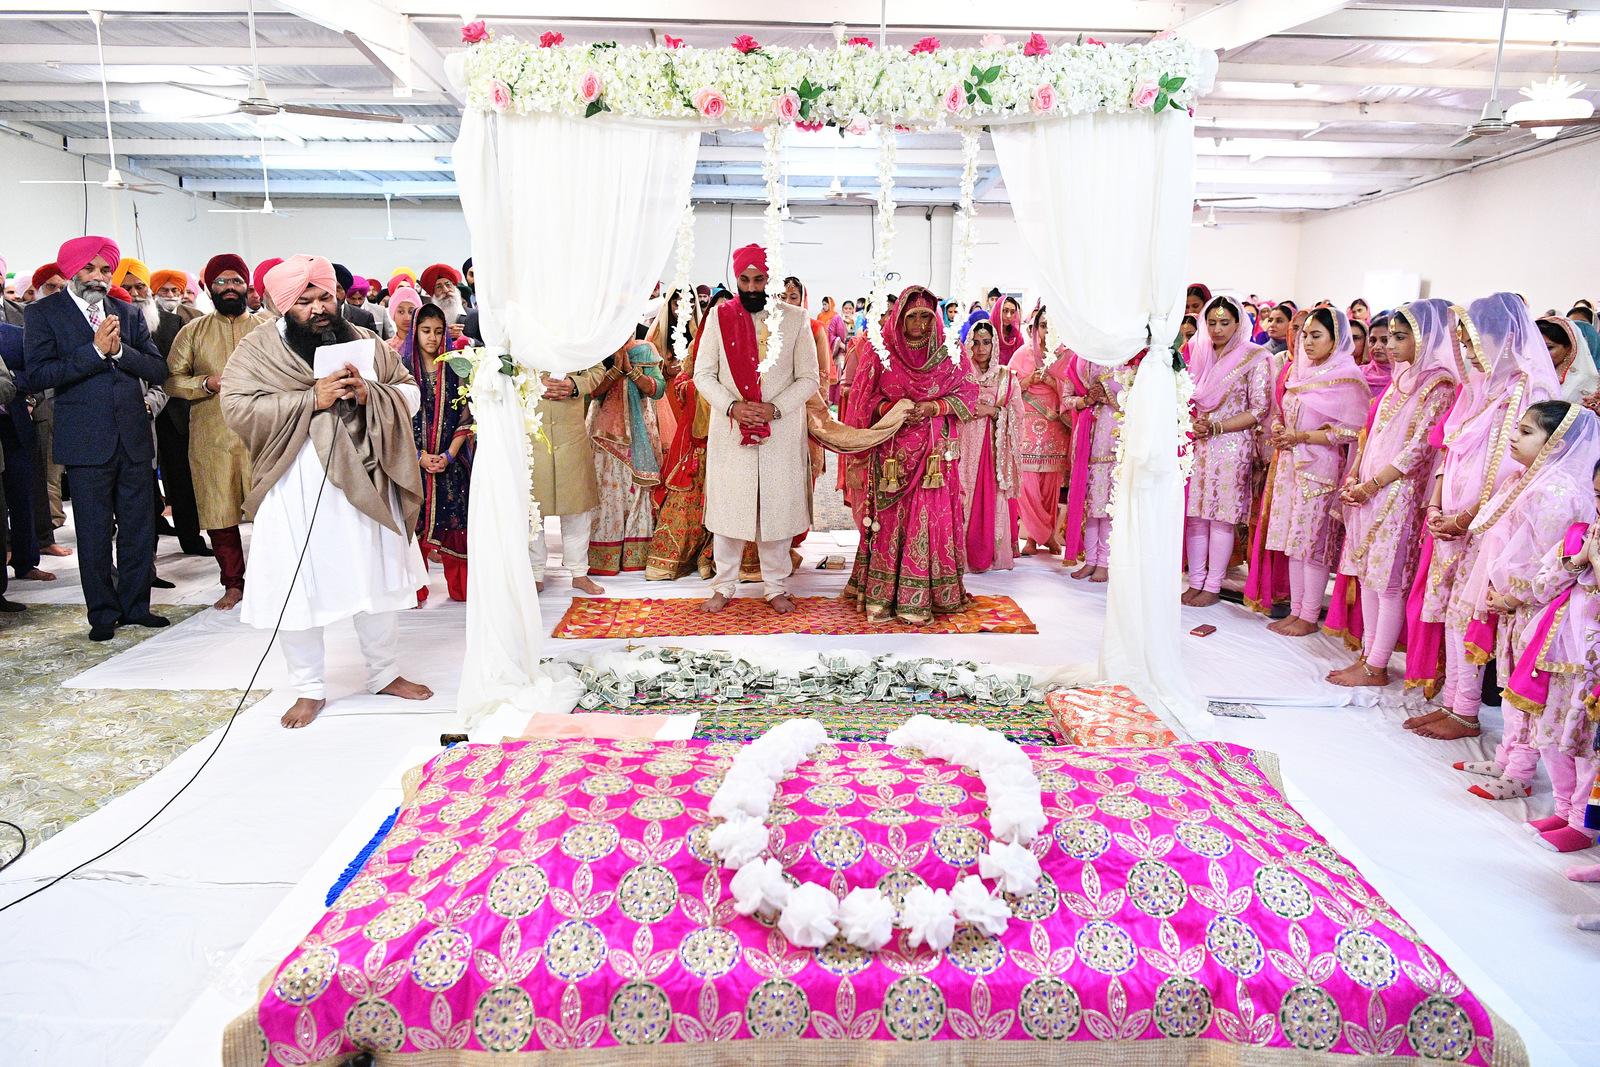 houston-weddings-manjot-karanjit-05.jpg